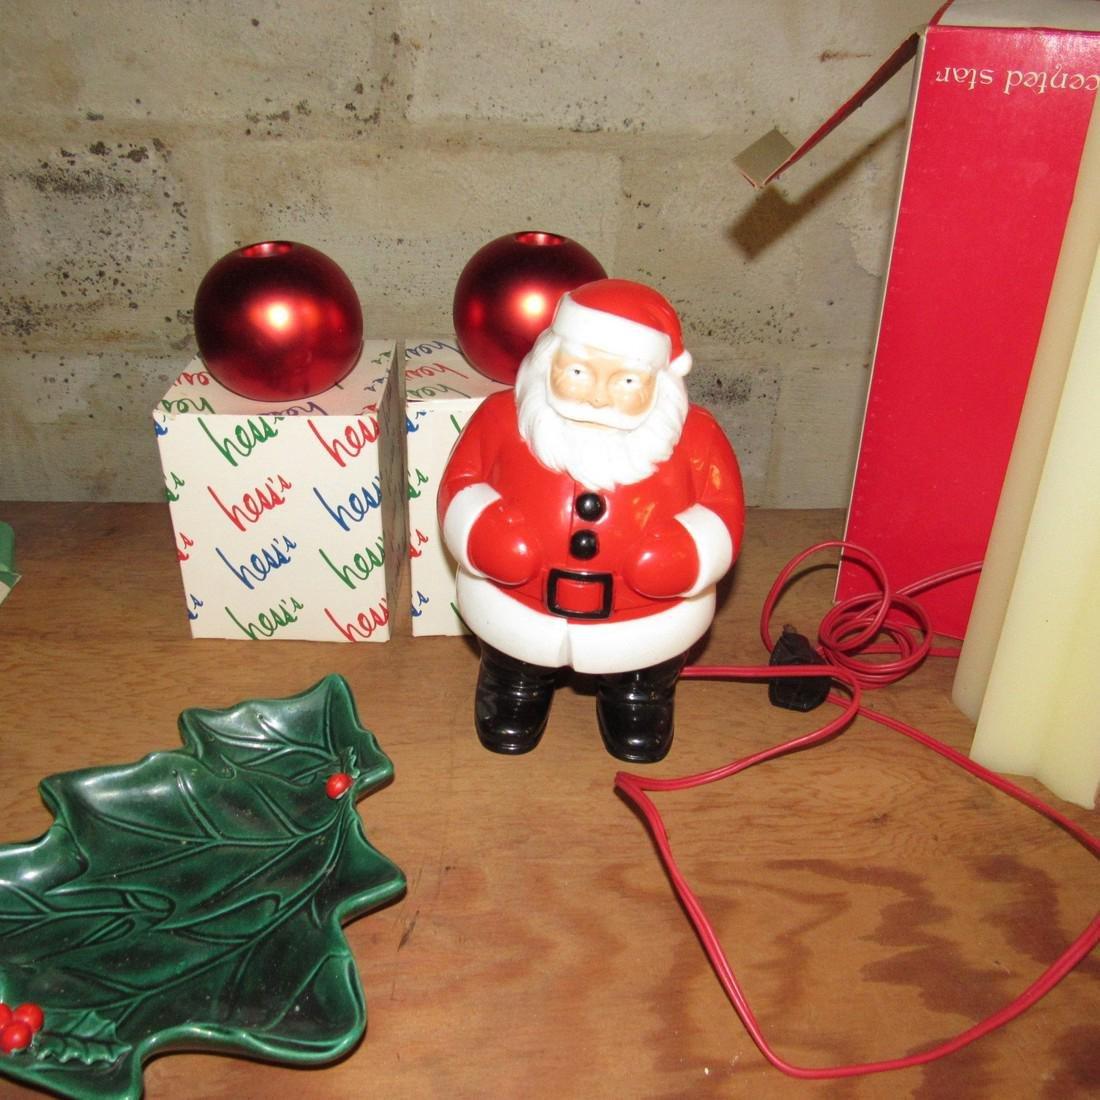 Christmas Lot Light Up Santa Ornaments - 2